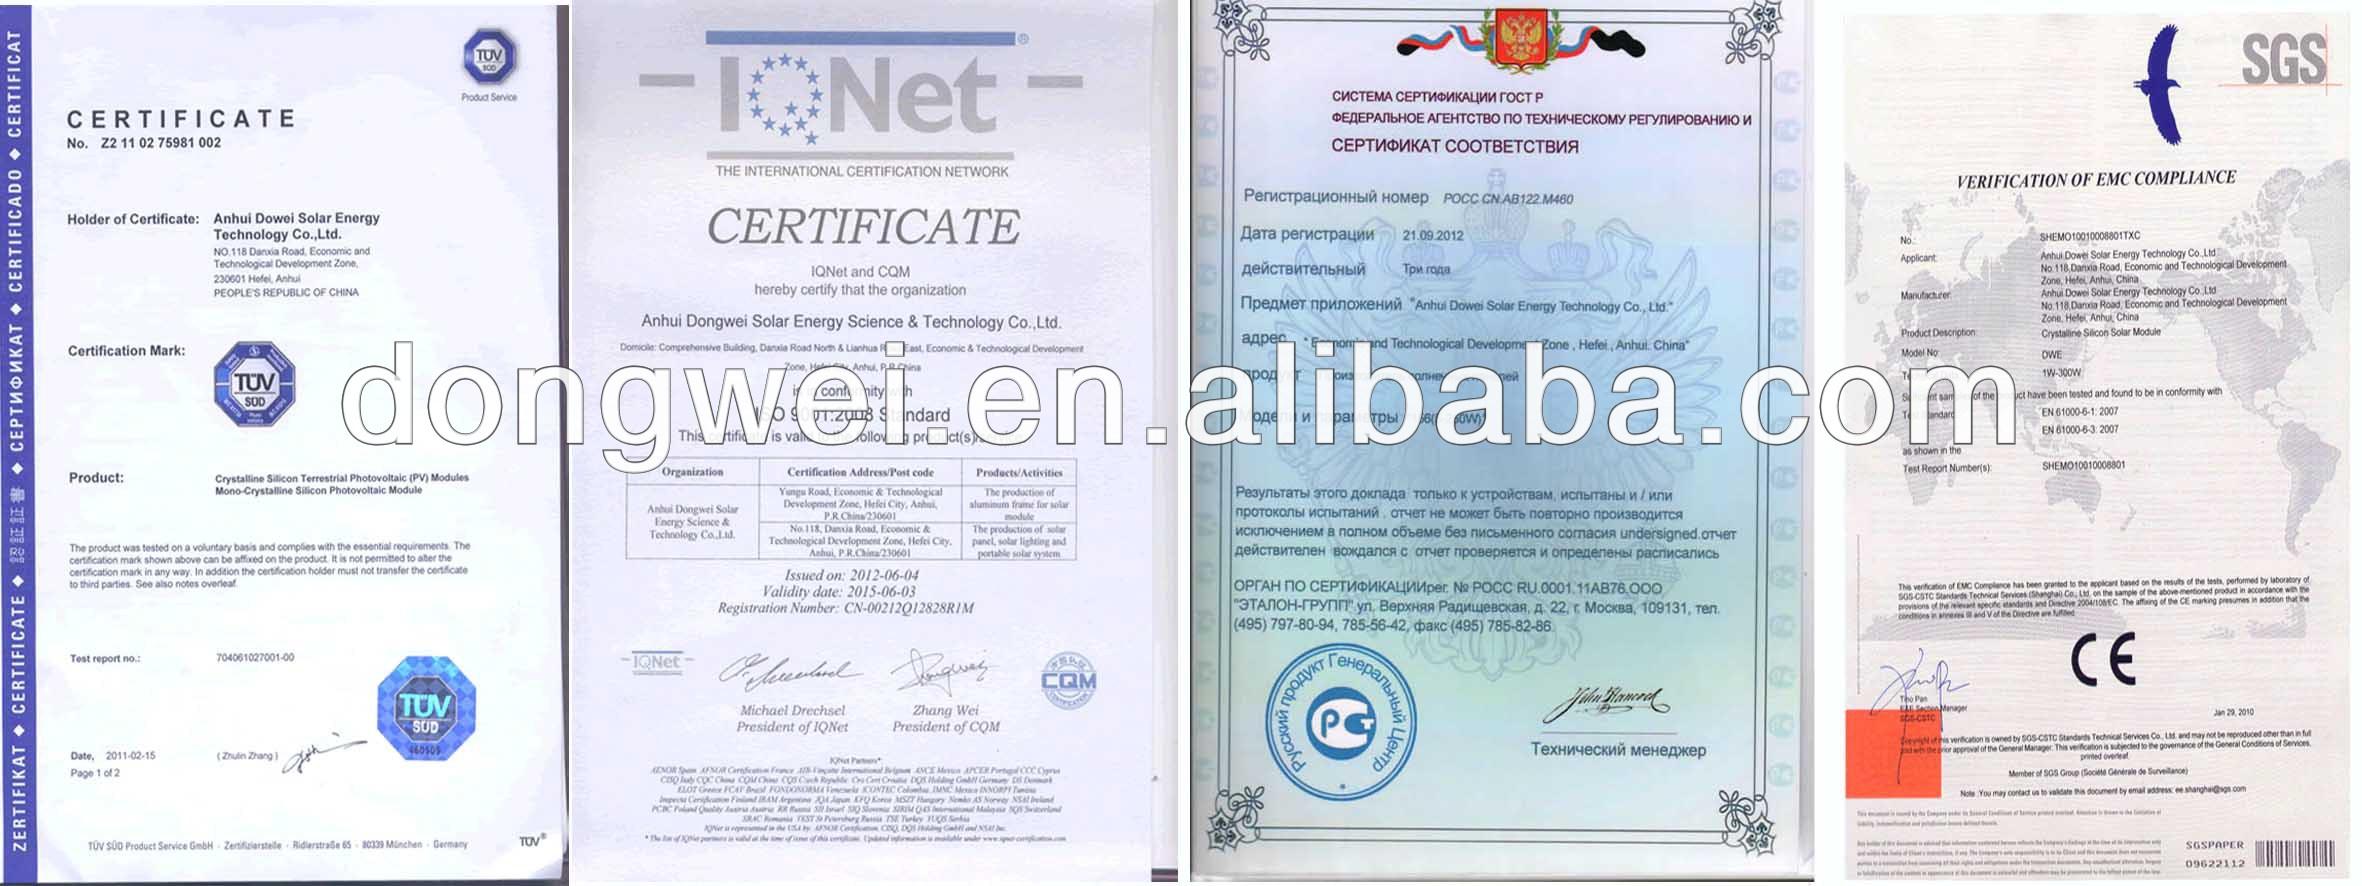 Best price per watt solar panels,hot sells TUV certified solar panel module